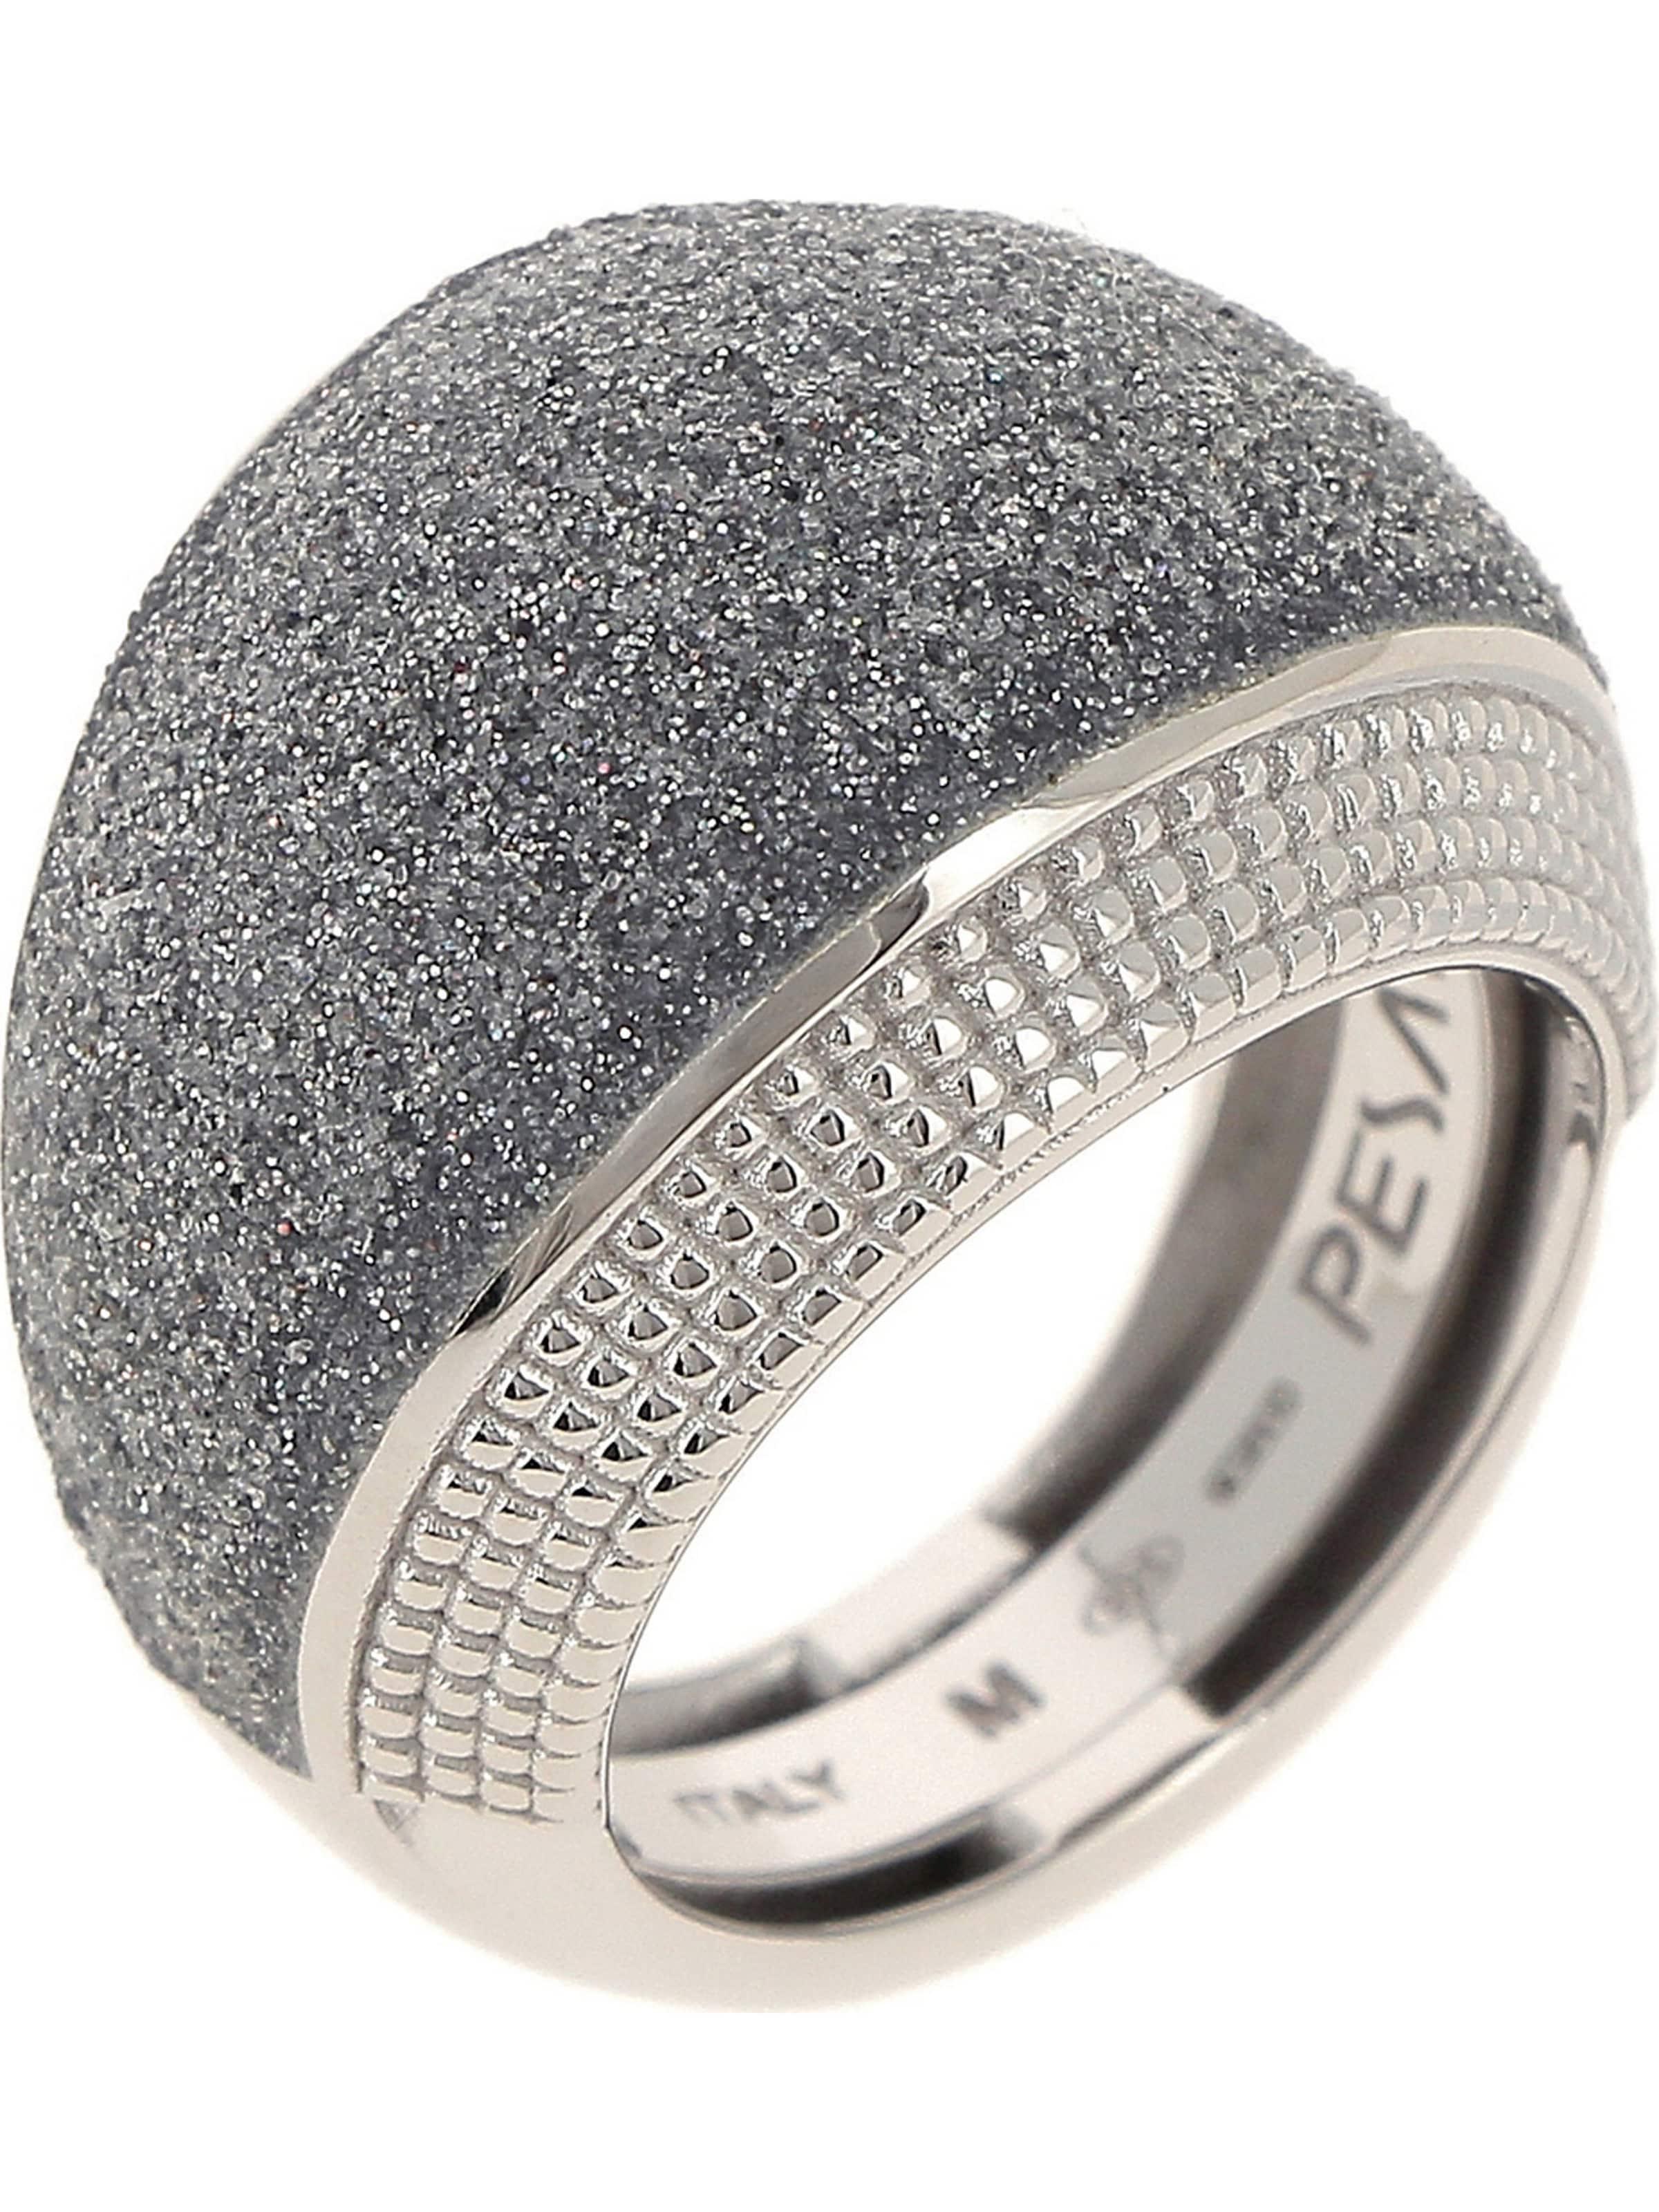 Ring Silber Ring In Pesavento Ring Pesavento In Silber Ring In Pesavento Silber Pesavento 1K3uTJlcF